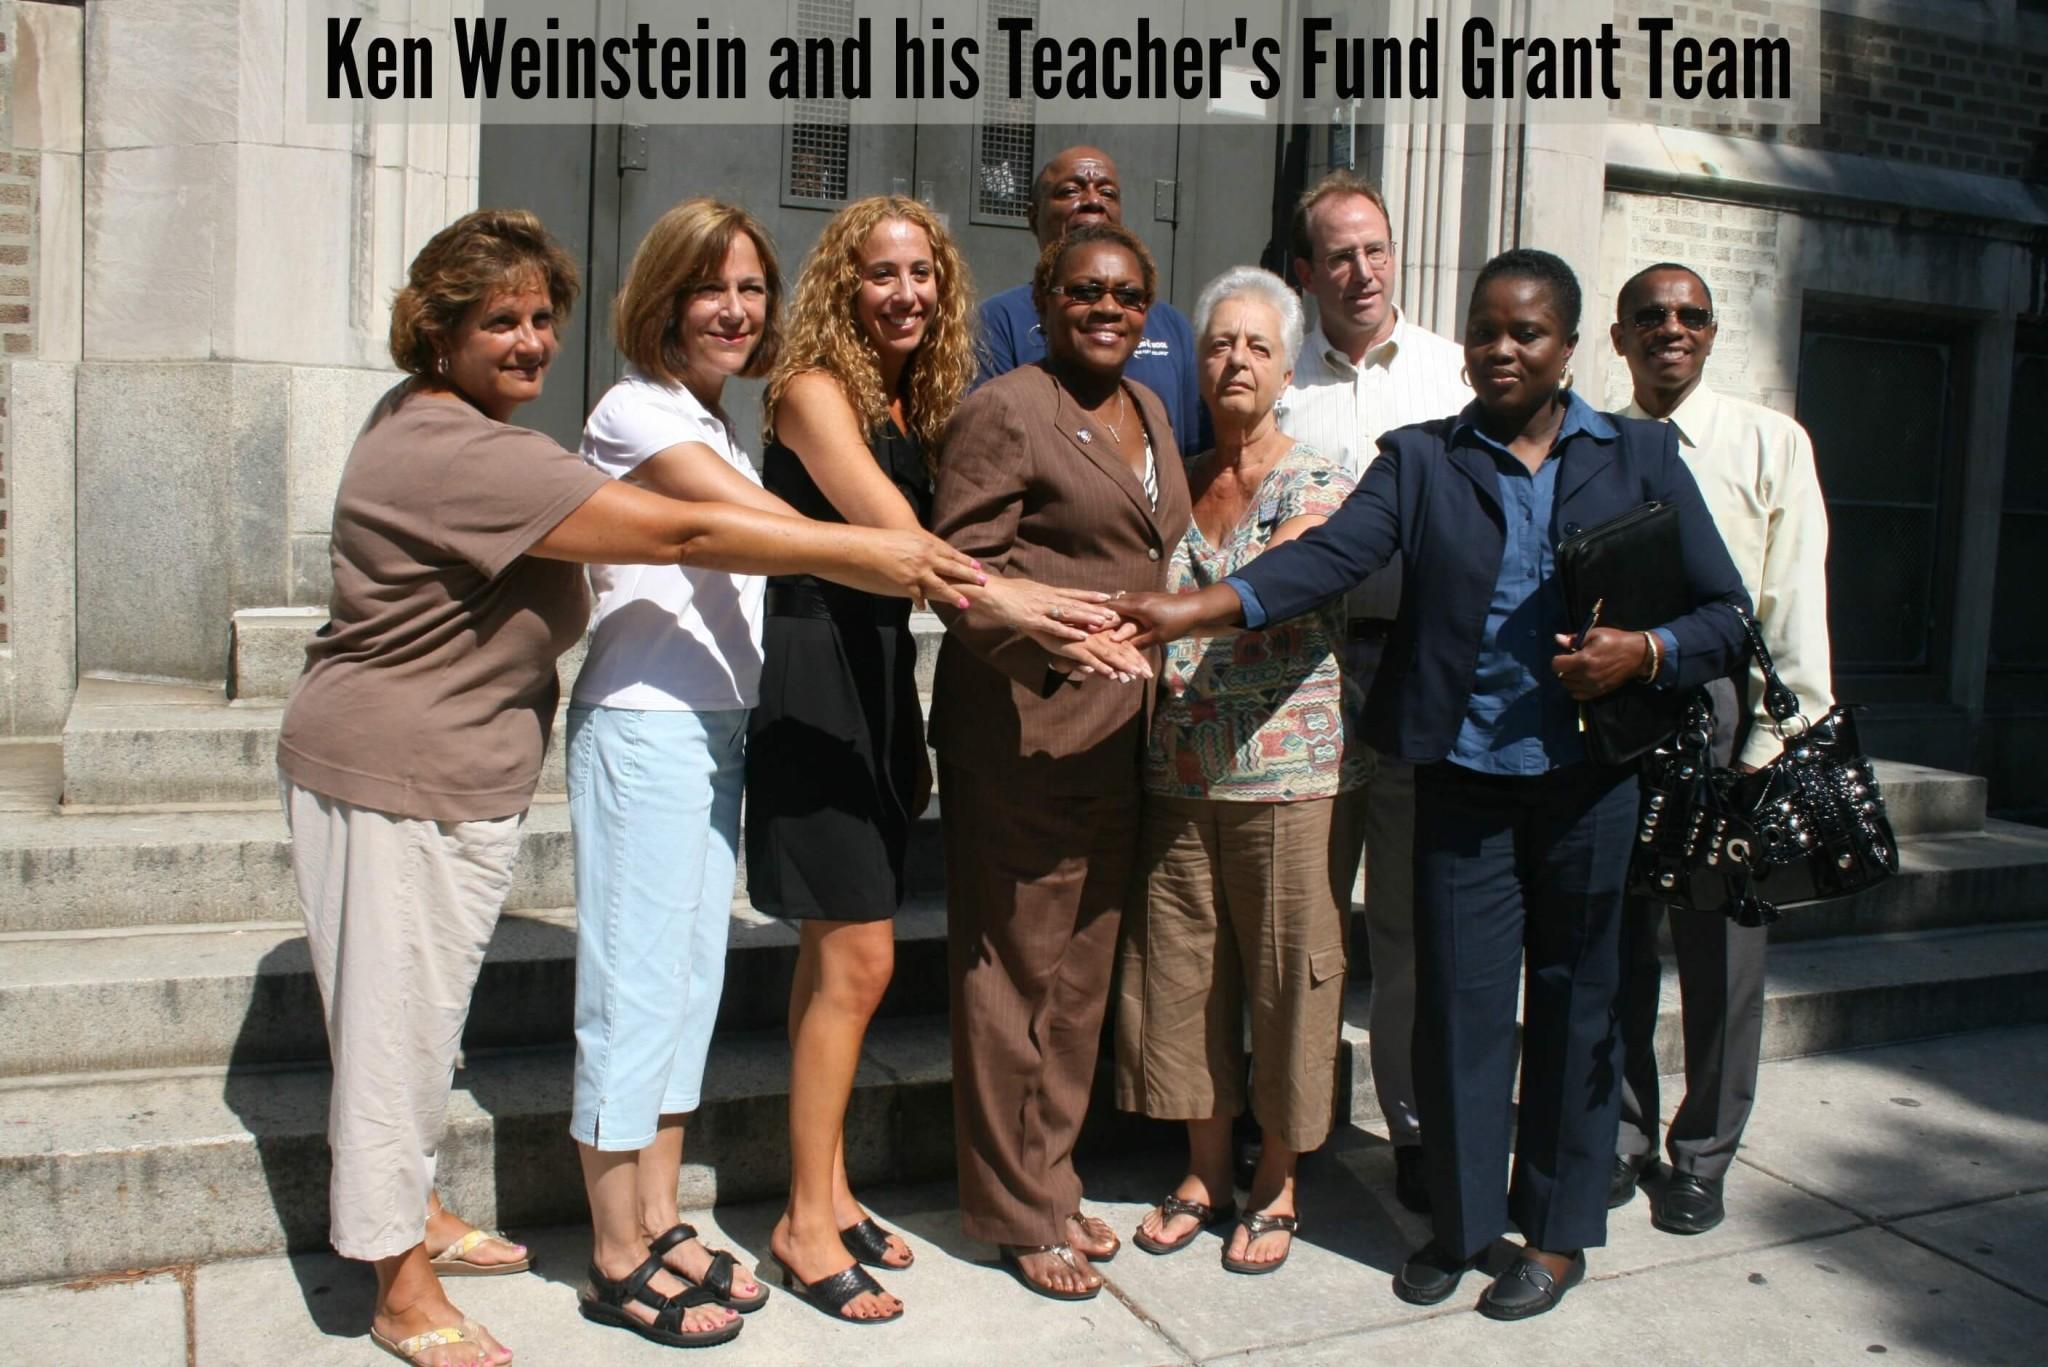 East Falls Local.Ken Weinstein and team